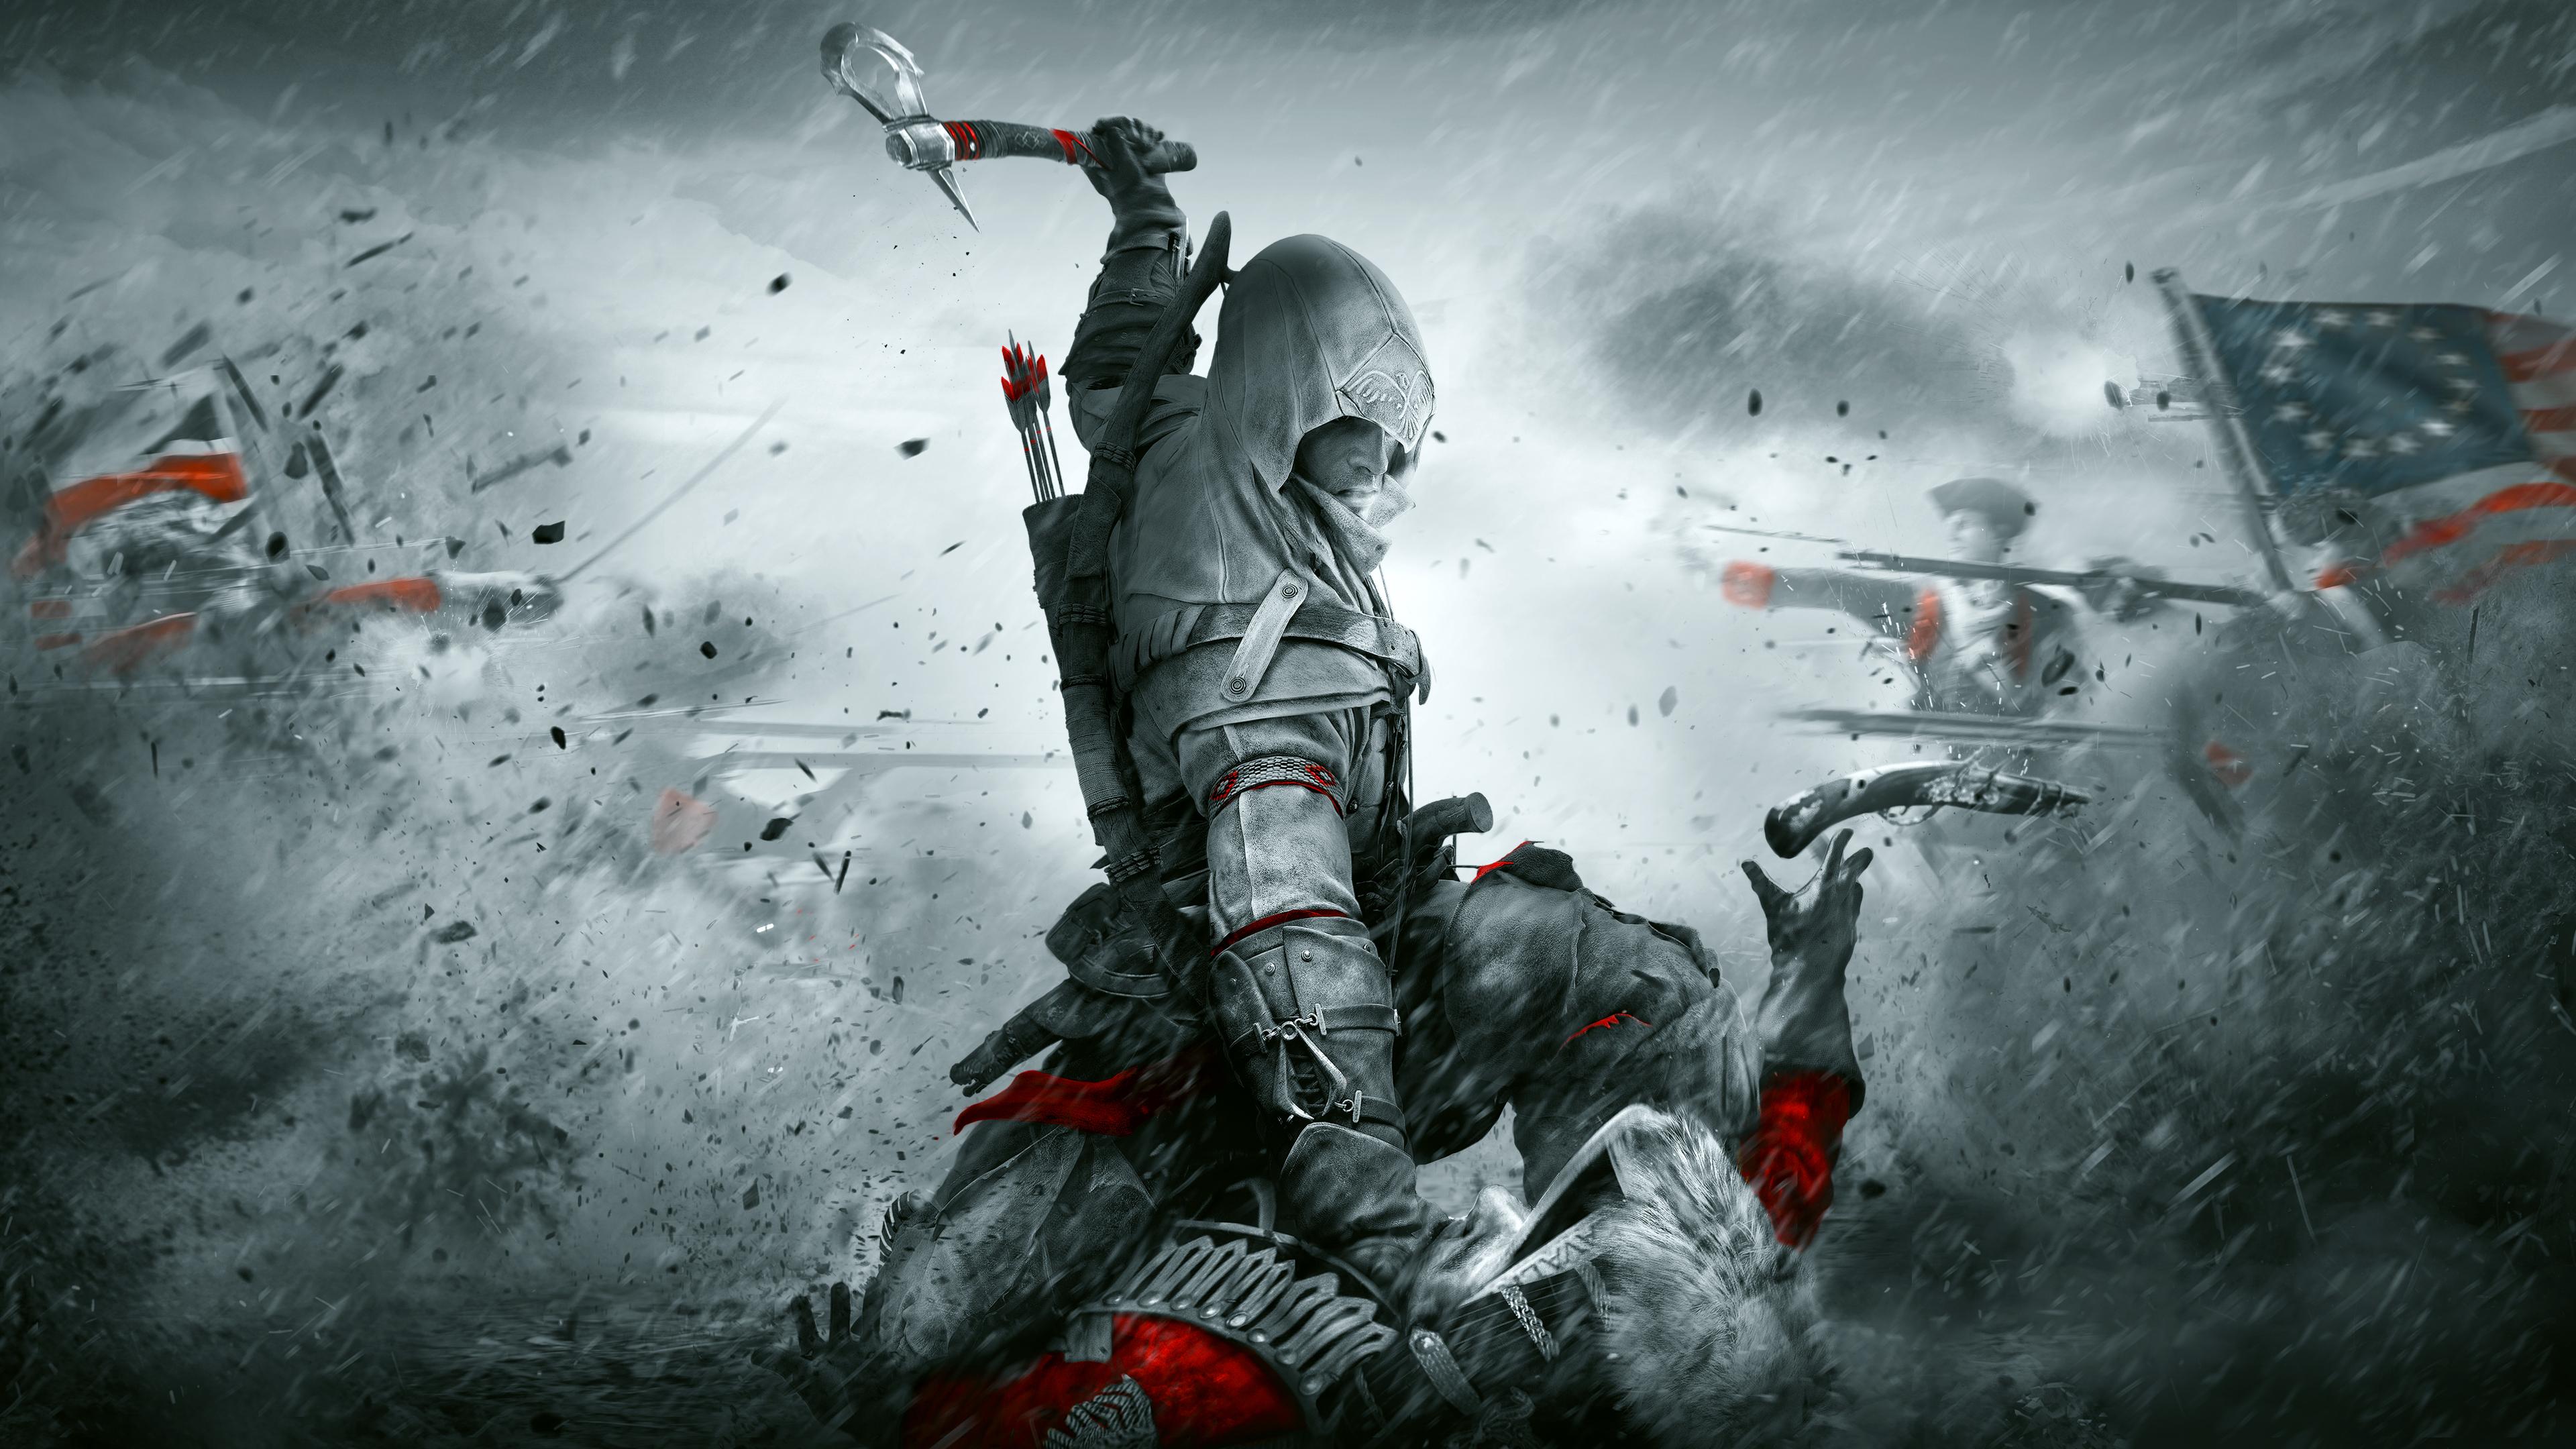 Assassins Creed Iii 4k Ultra Hd Wallpaper Background